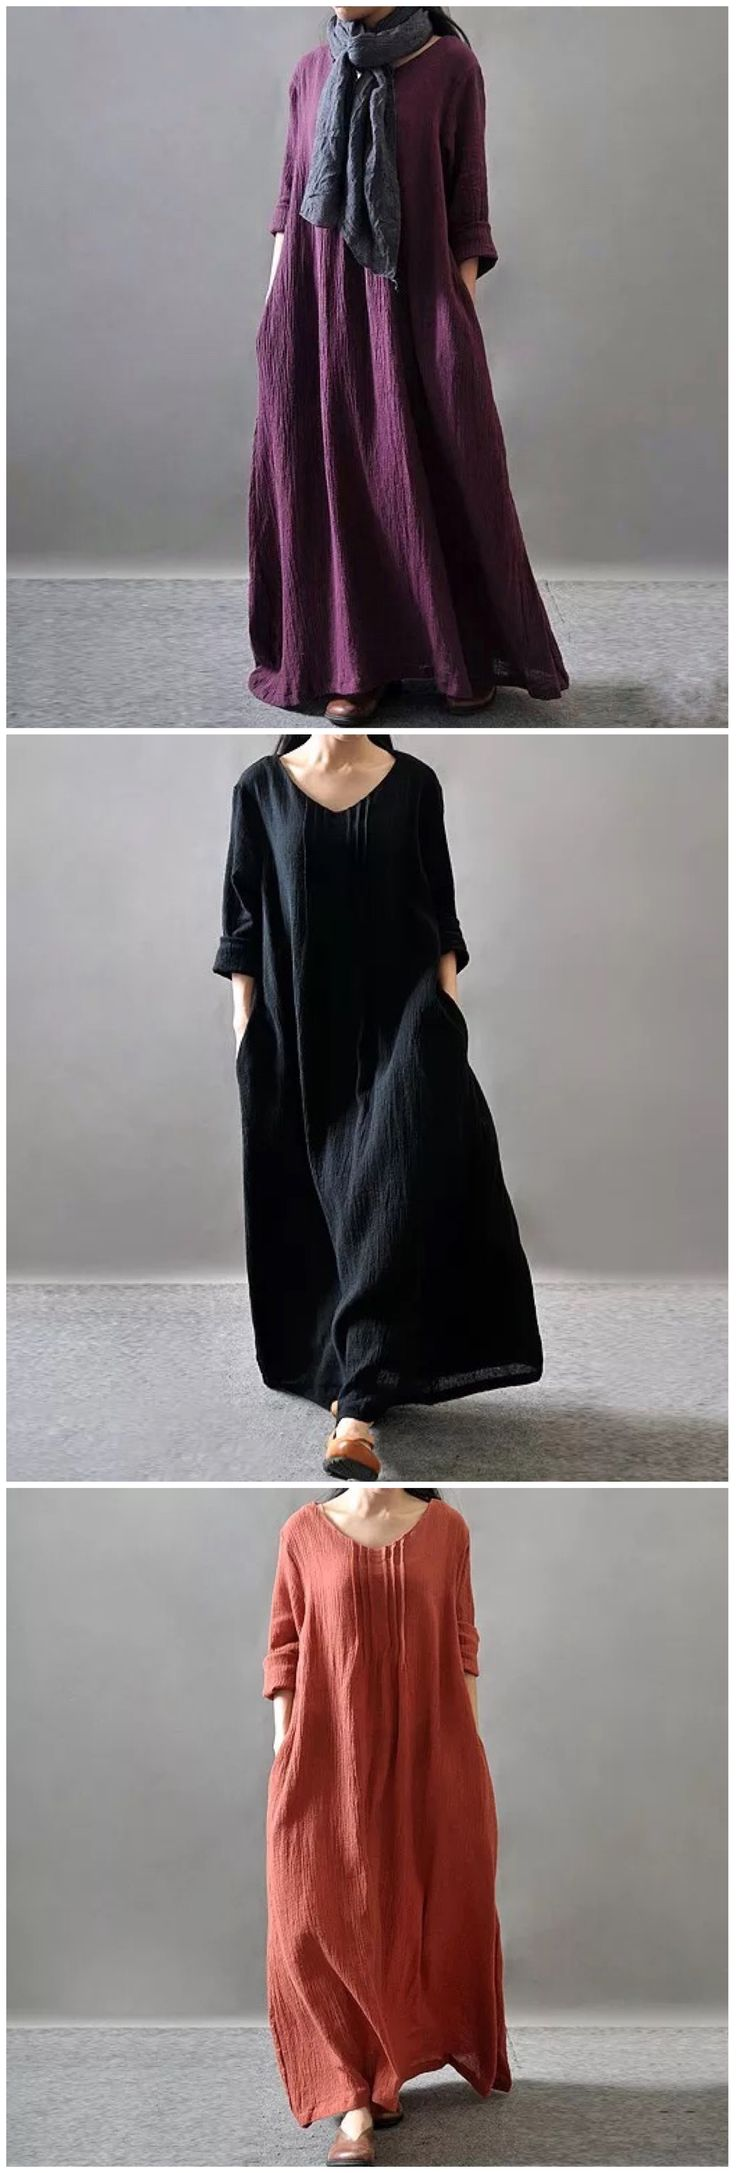 Fabric: Fabric is not stretch Season: Summer,Autumn, Spring, Type: Dress Pattern Type: Plain Sleeve Length: Bat Short Sleeve Color: Purple/Black/Orange Dresses Length: Maxi Style: Casual Loose Materia